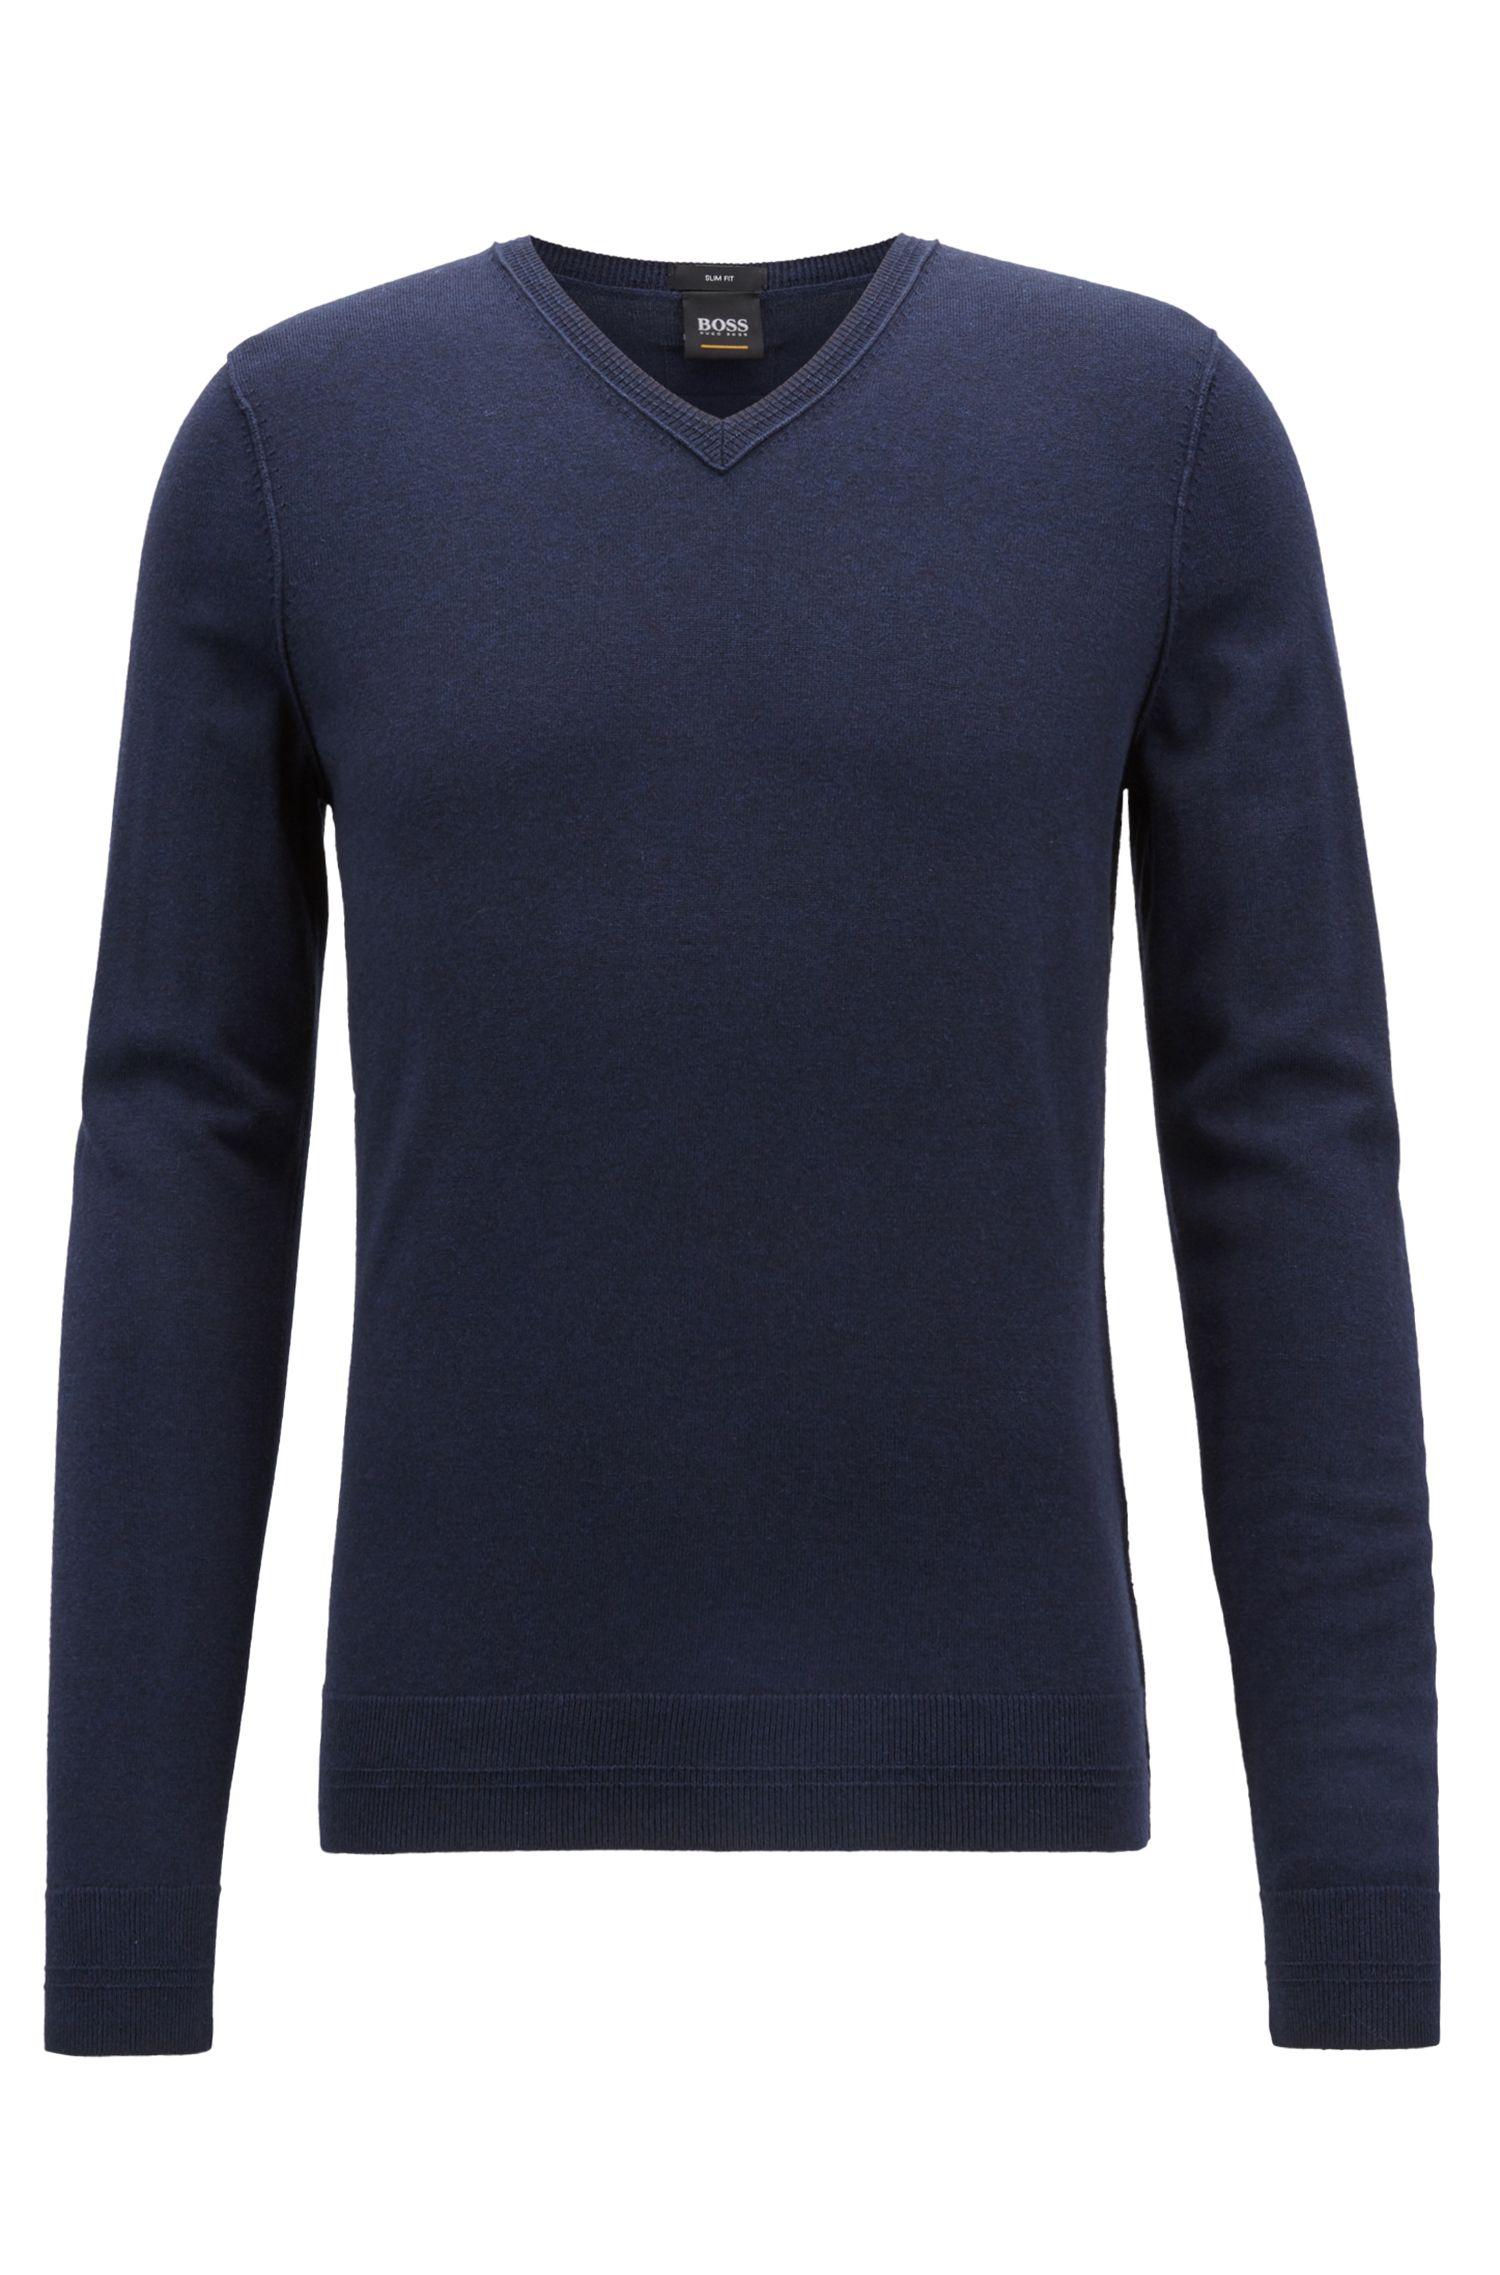 Jersey slim fit en mezcla de algodón con detalles de canalé en 3D